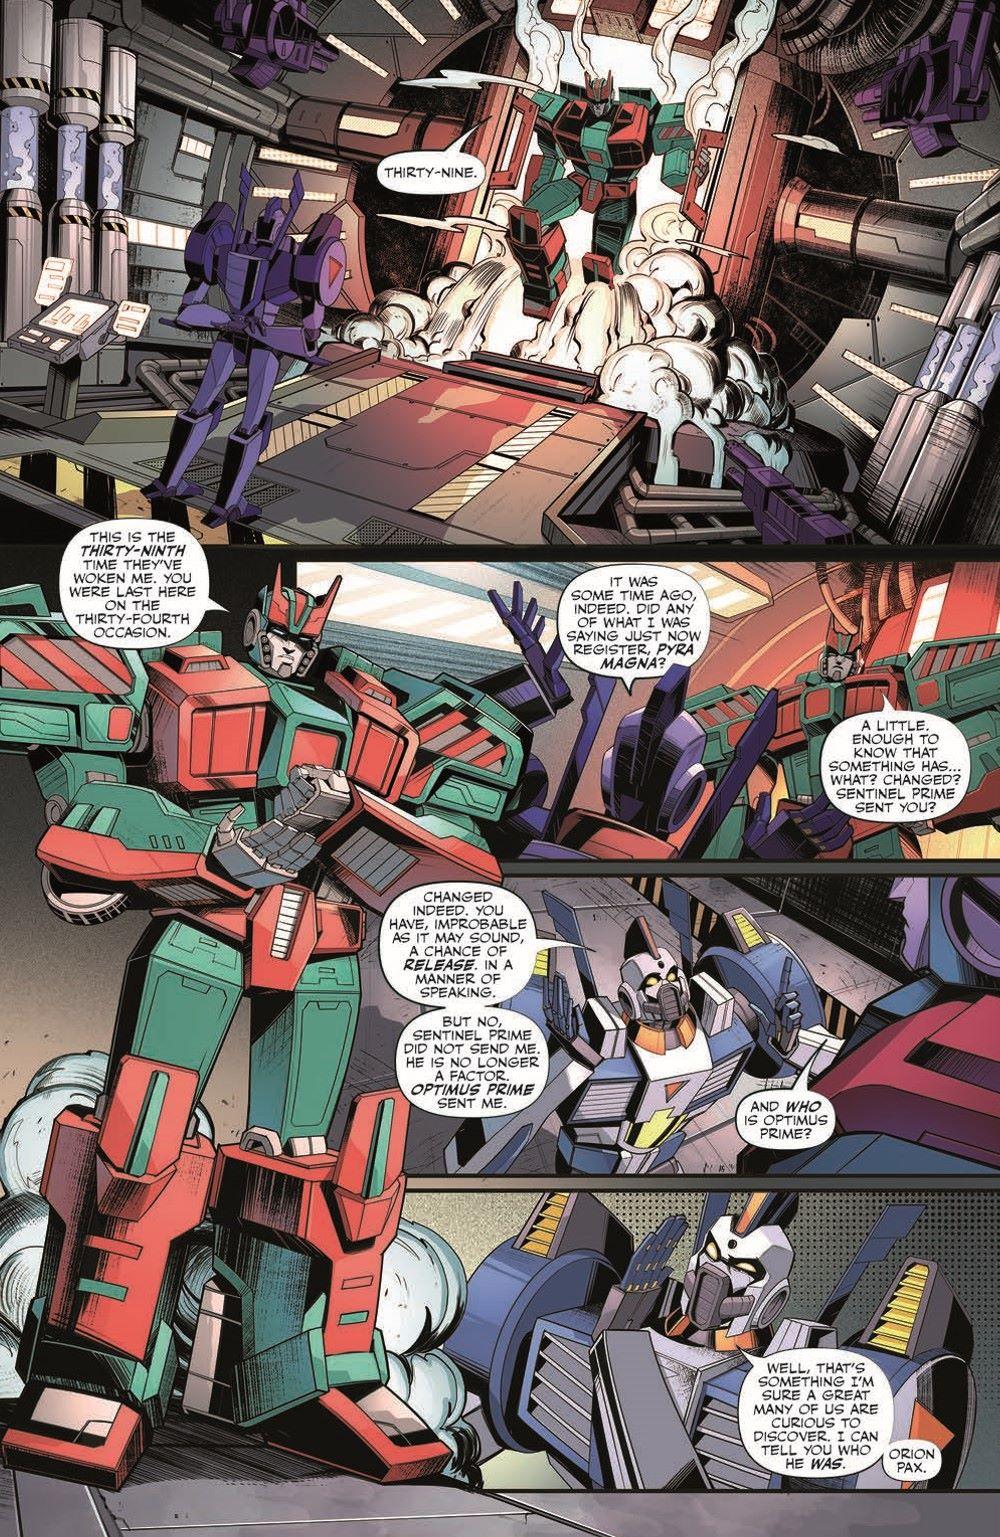 TF26-pr-5 ComicList Previews: TRANSFORMERS #26